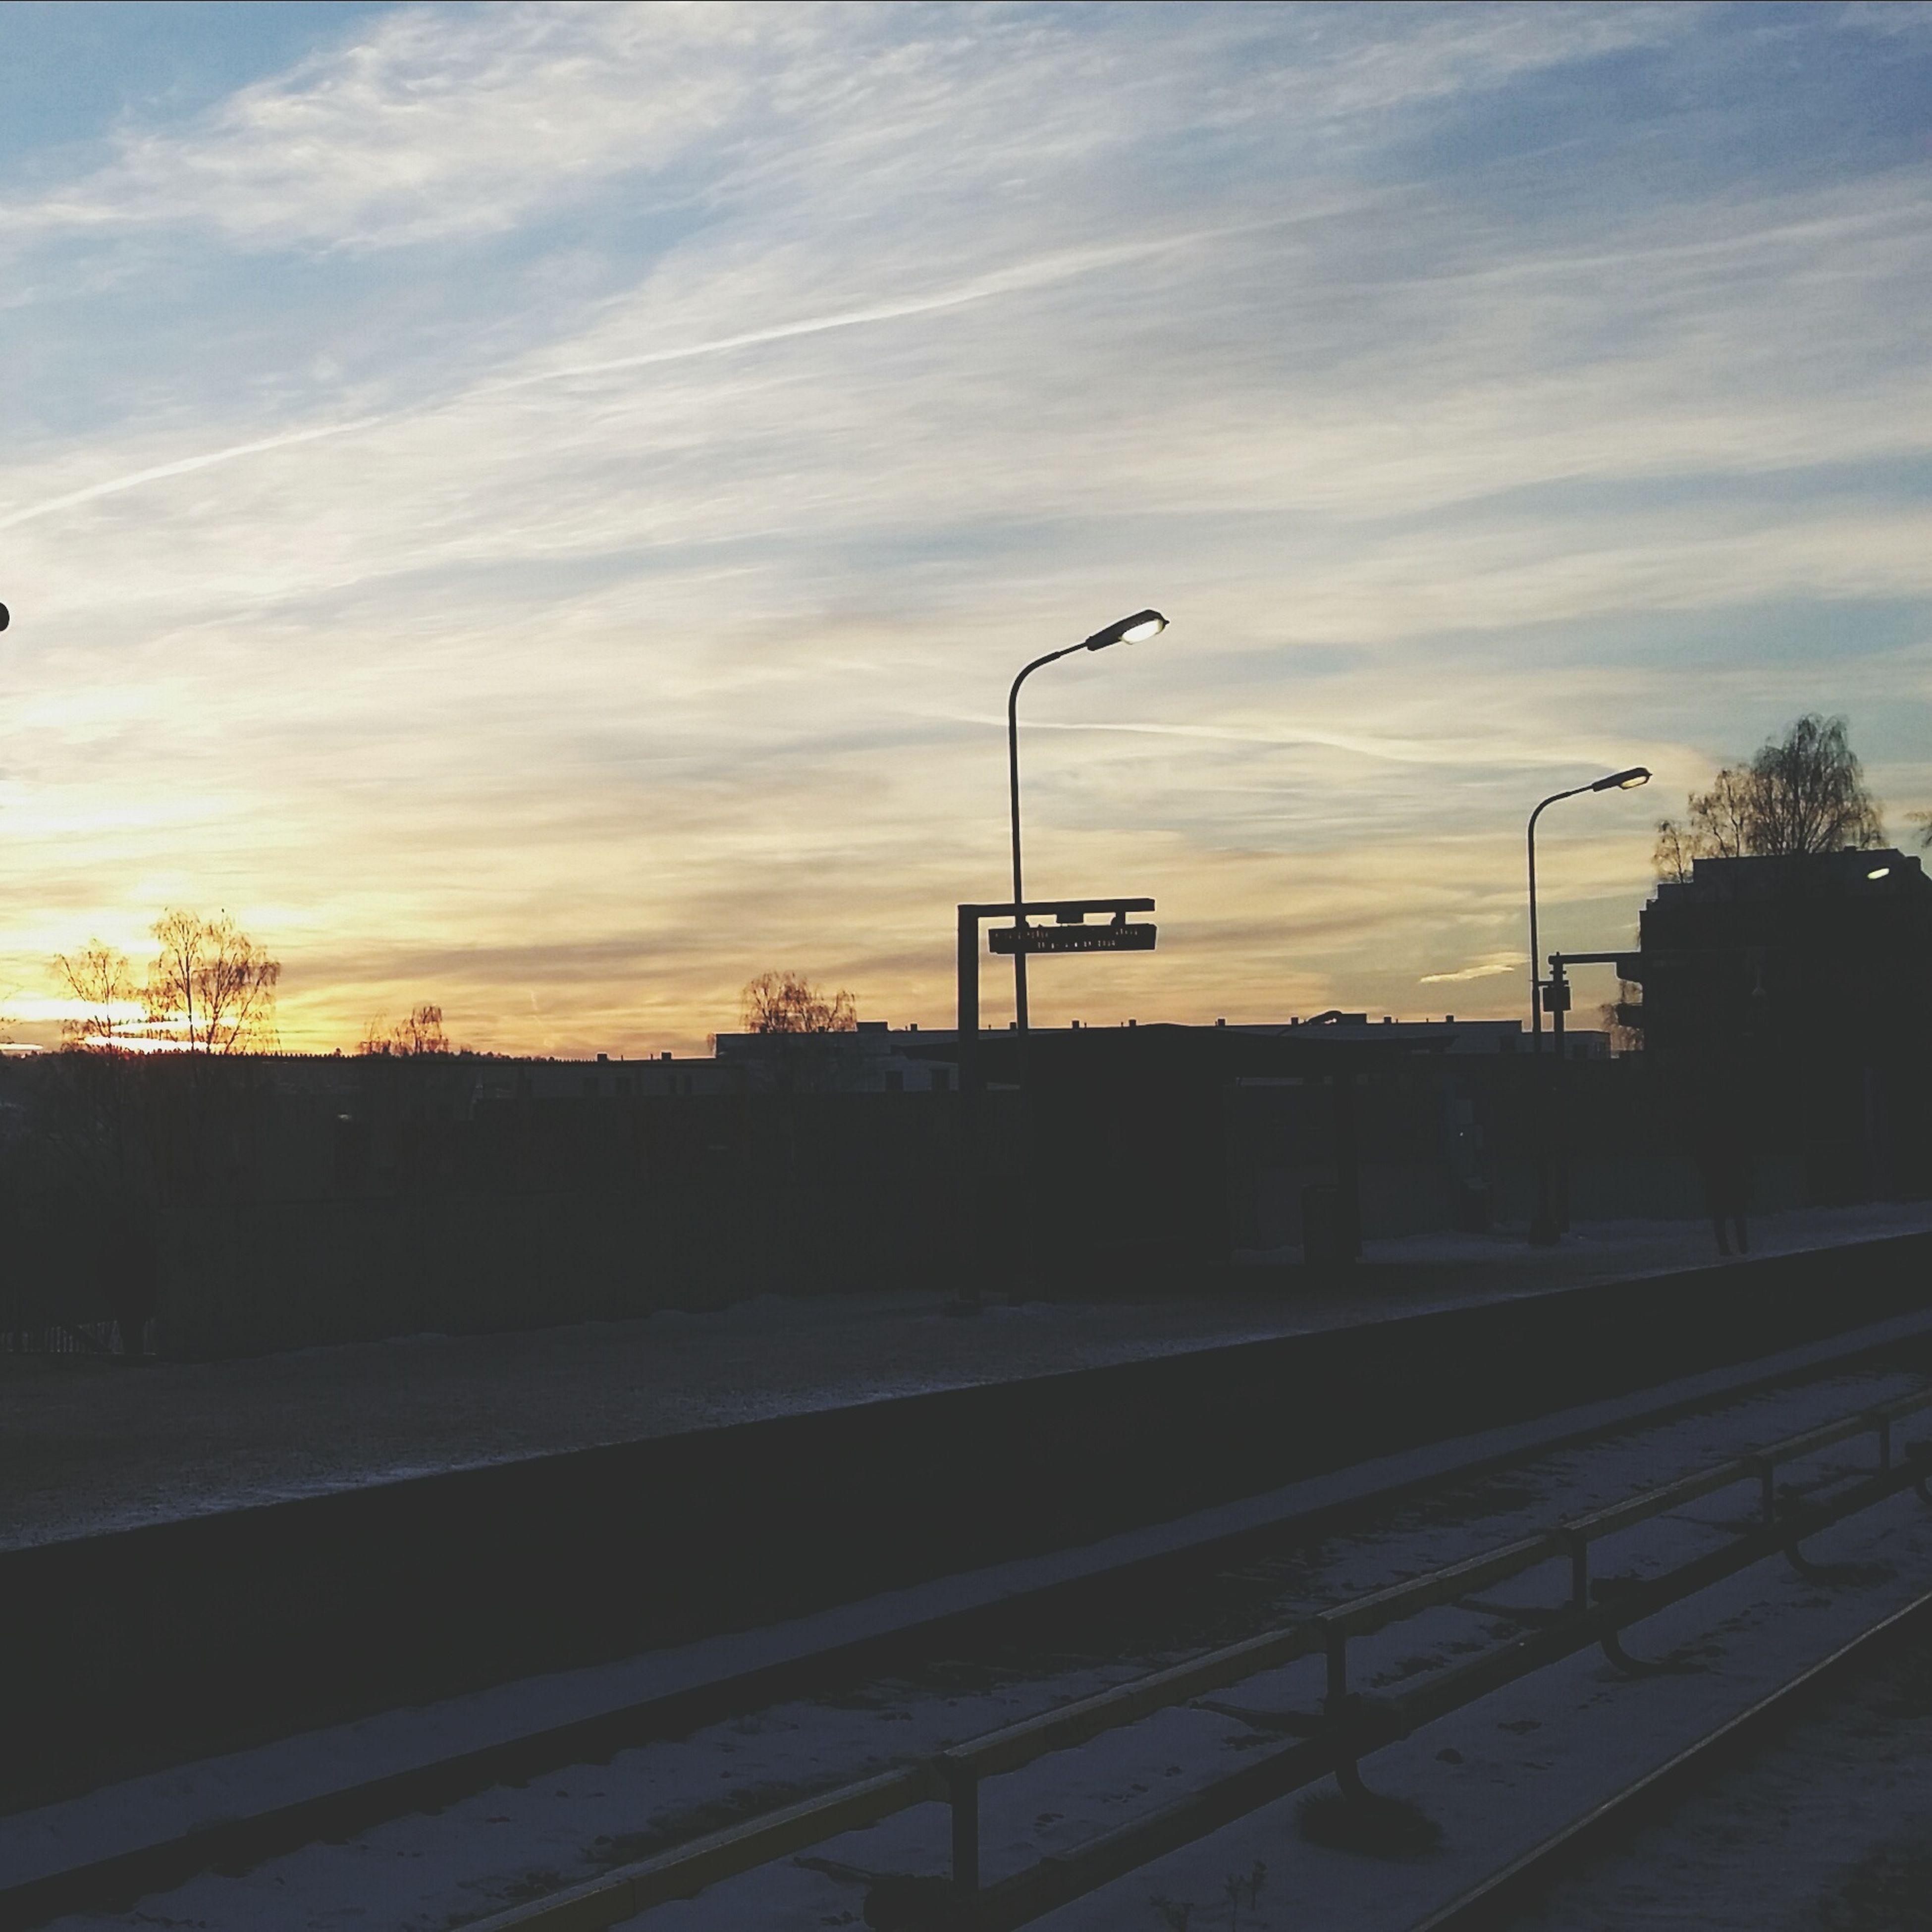 railroad track, sky, sunset, transportation, cloud - sky, street light, rail transportation, silhouette, tree, railing, built structure, road, railroad station, the way forward, railroad station platform, cloud, public transportation, no people, architecture, outdoors